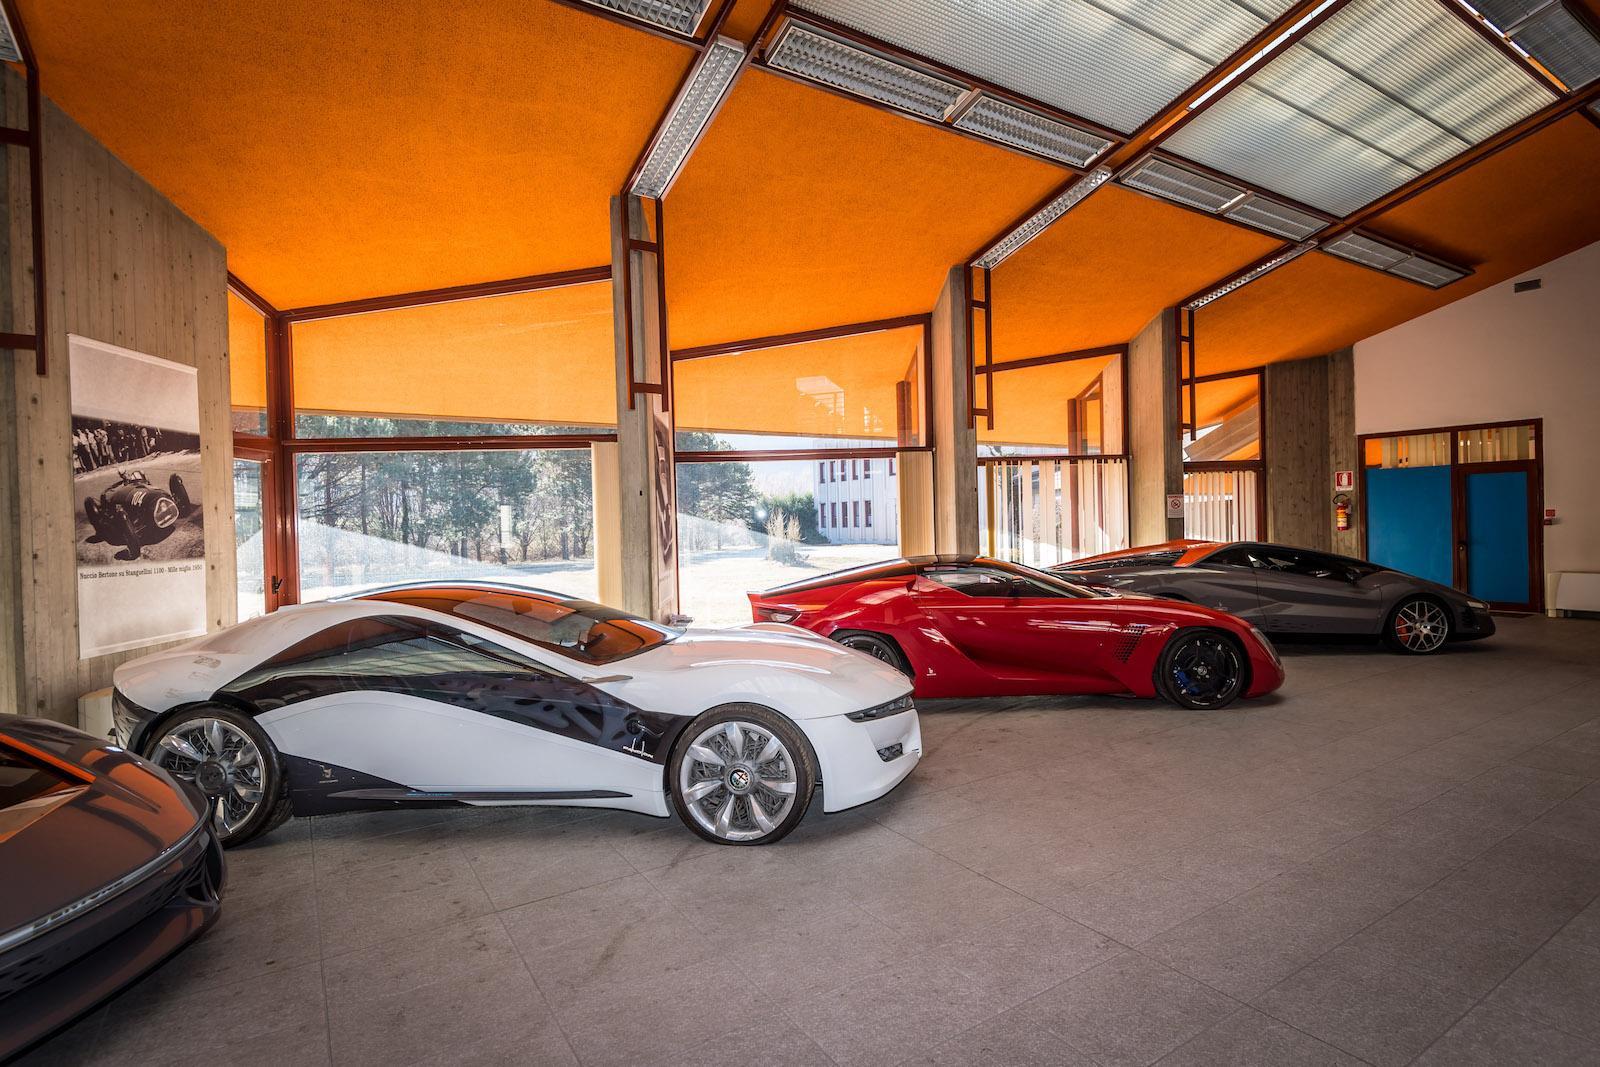 Italian auction house announces first classic car sale